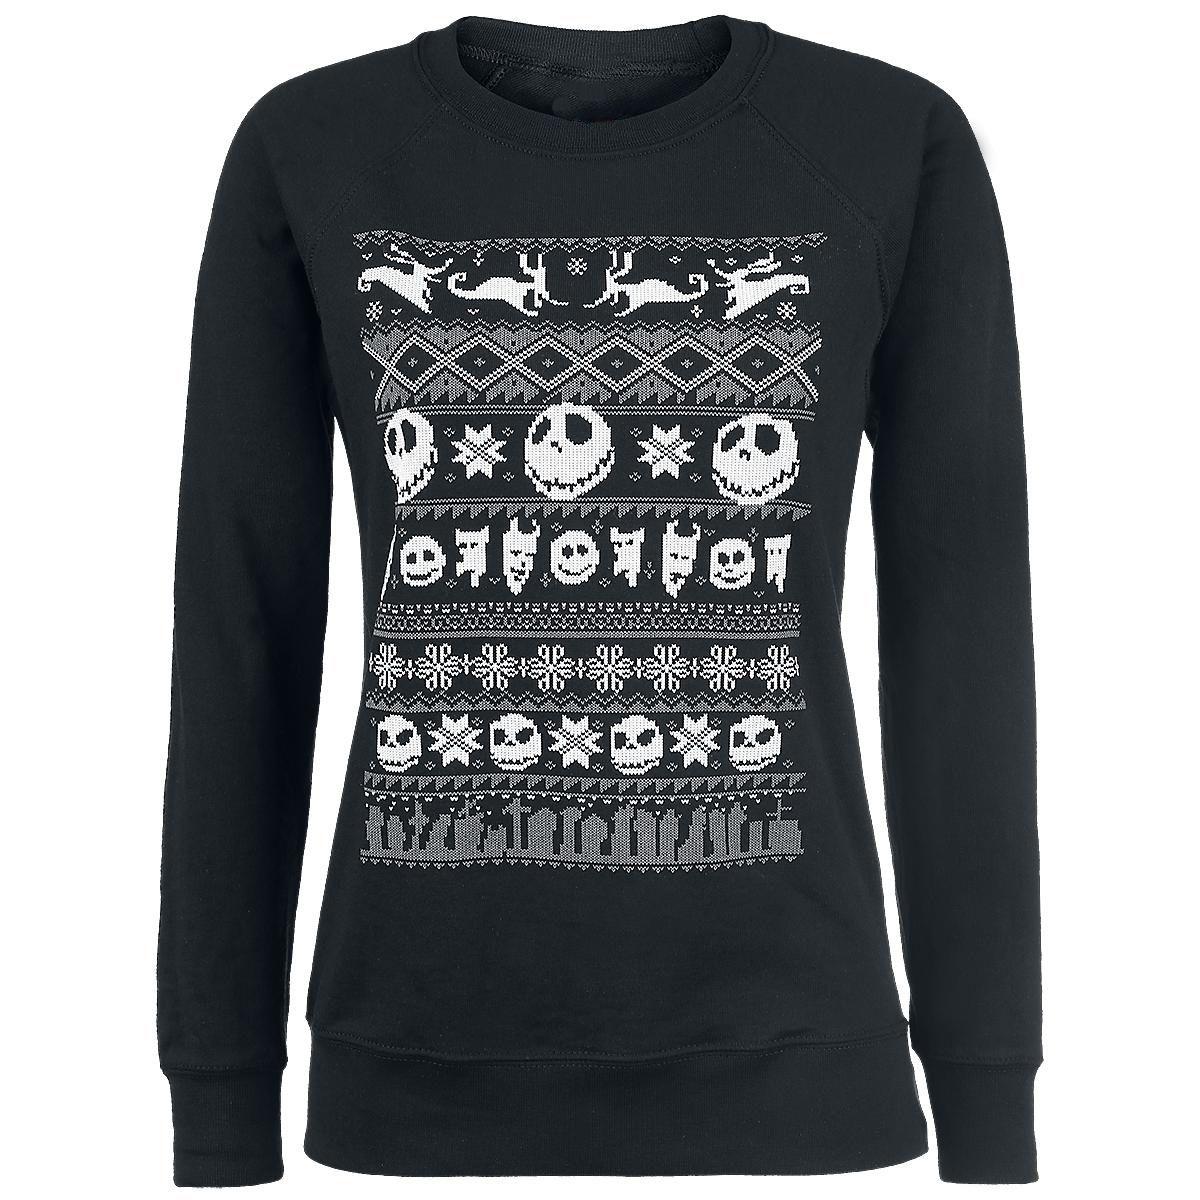 Sweat Nightmare Before Christmas. | Nightmare Before Christmas ...